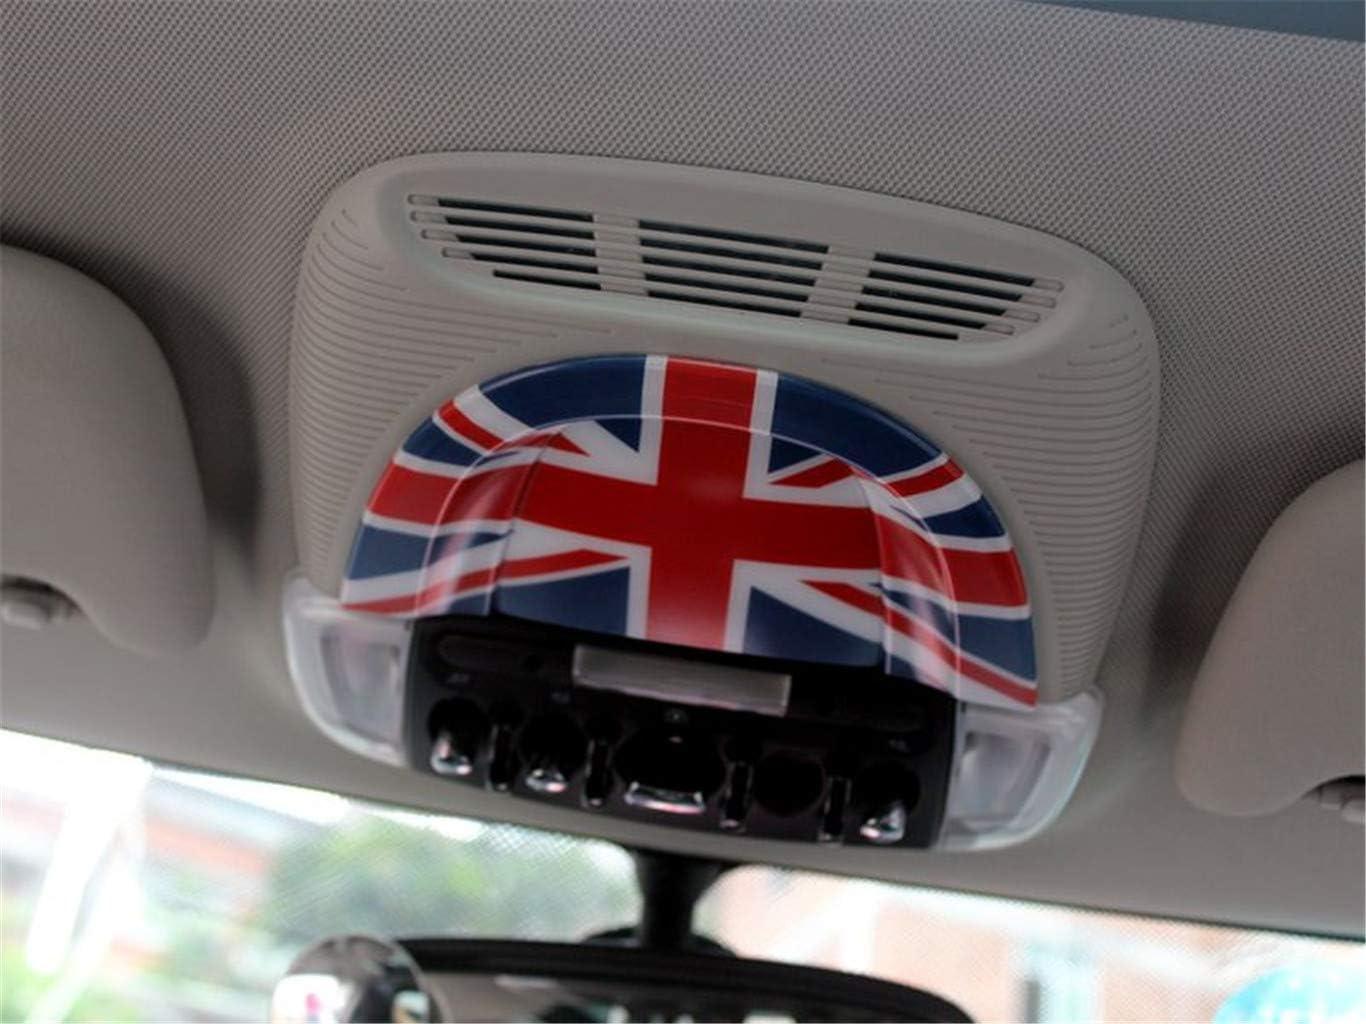 HDX Red//Blue Union Jack UK Flag ABS Sticker Cover Trim Cap for Mini Cooper ONE S JCW F Series F54 Clubman 2016+ Door Armrest Window Regulator Lift Frame